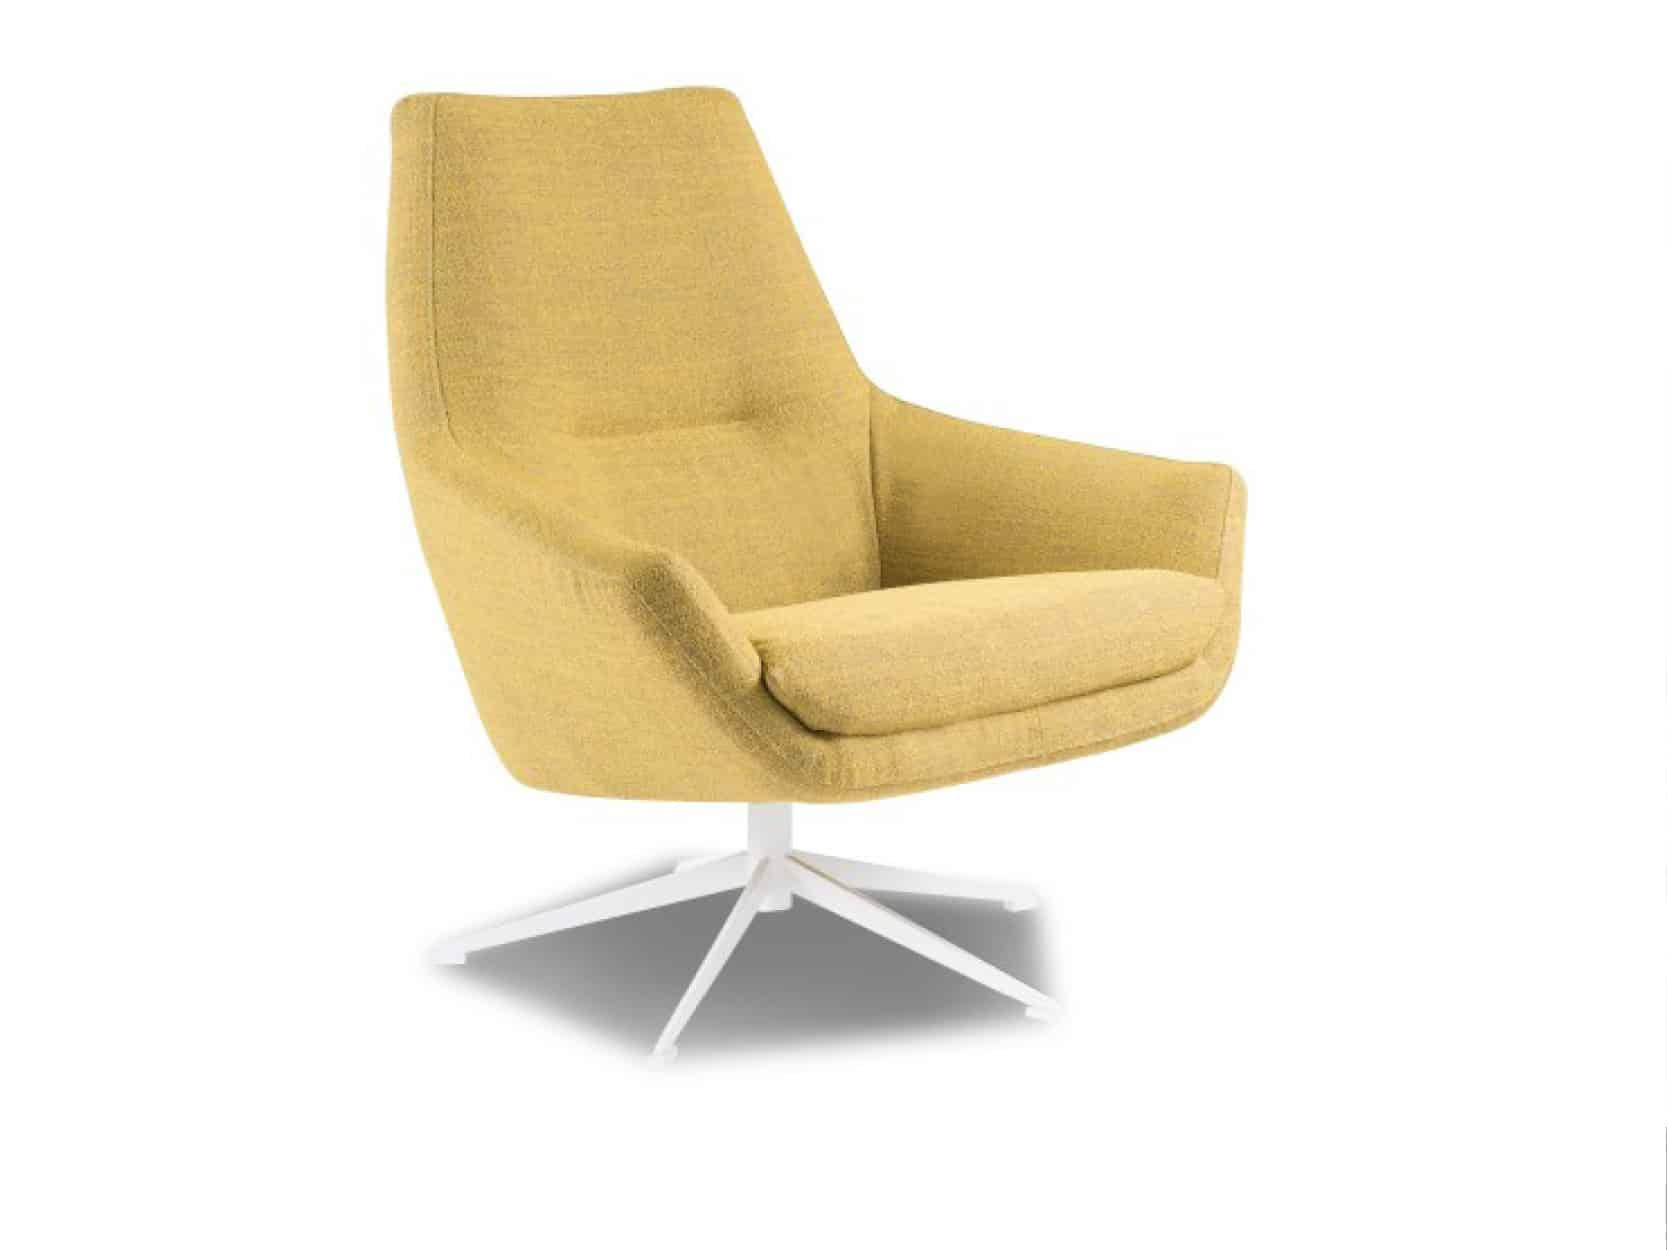 Movani fauteuil Smile sf